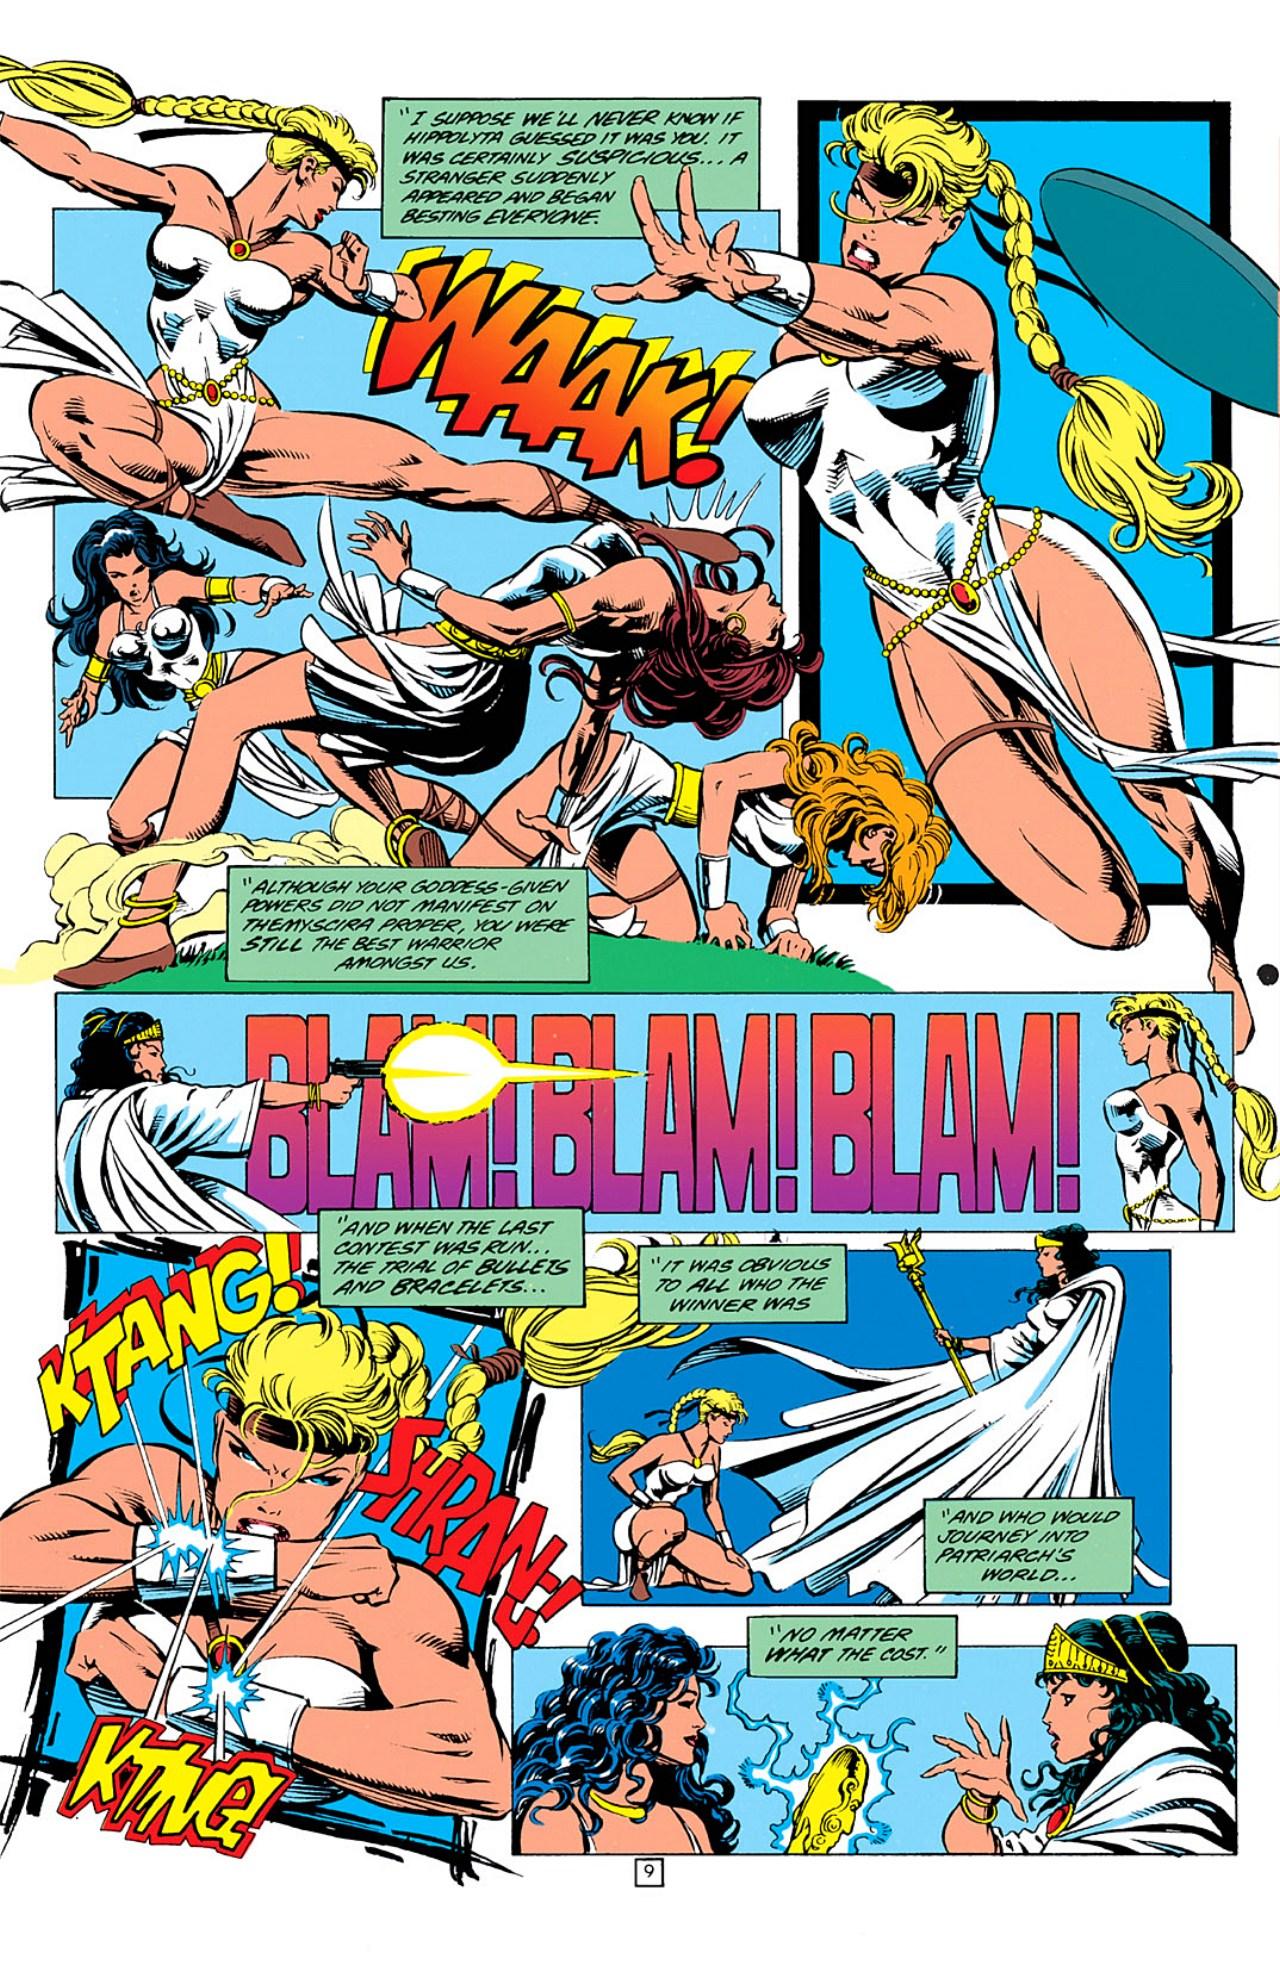 Read online Wonder Woman (1987) comic -  Issue #0 - 10